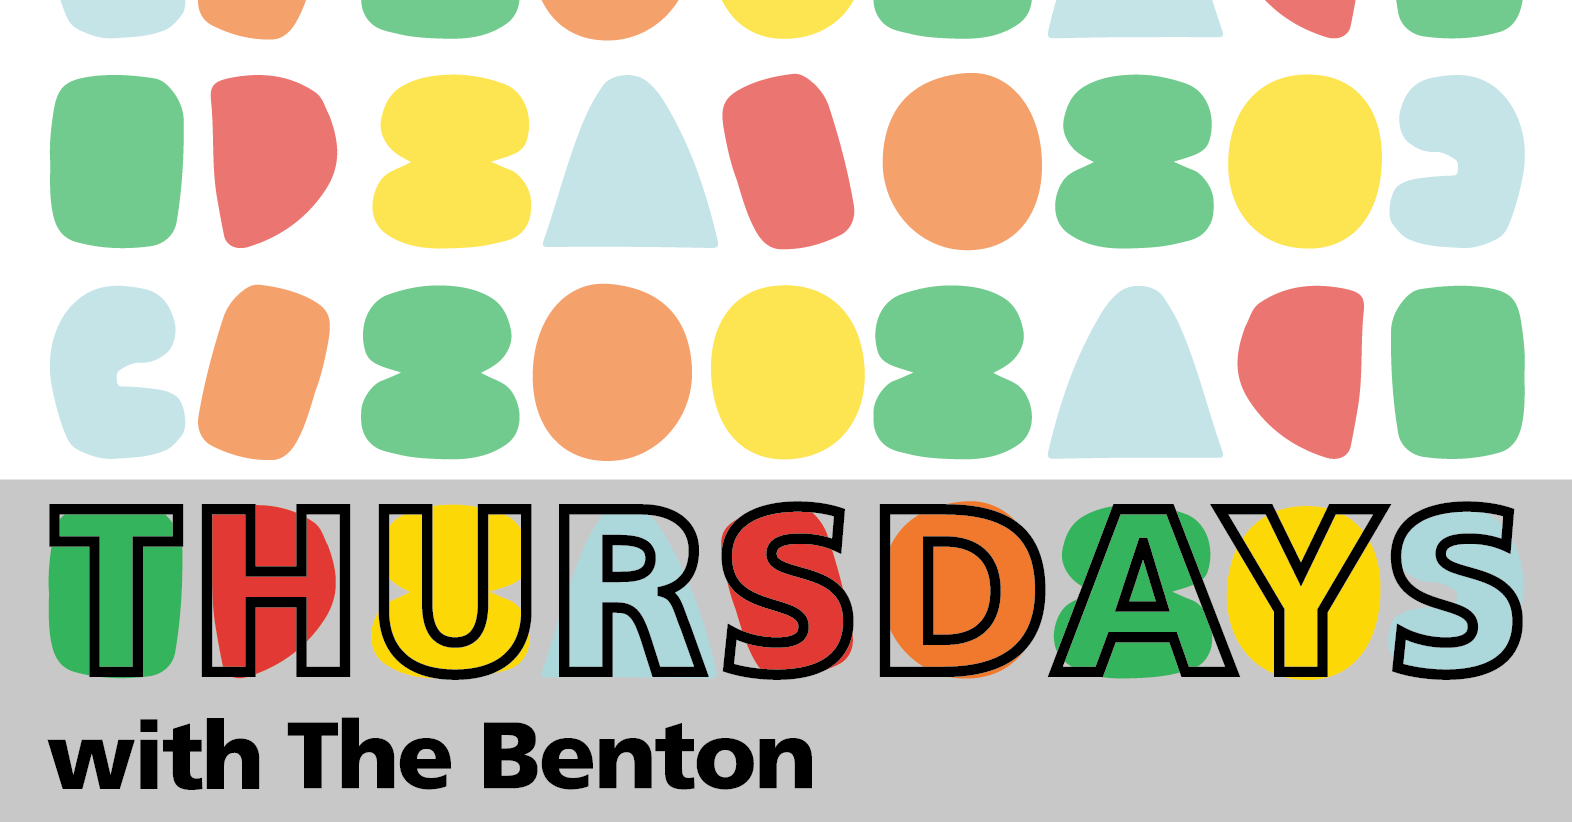 Thursdays with The Benton